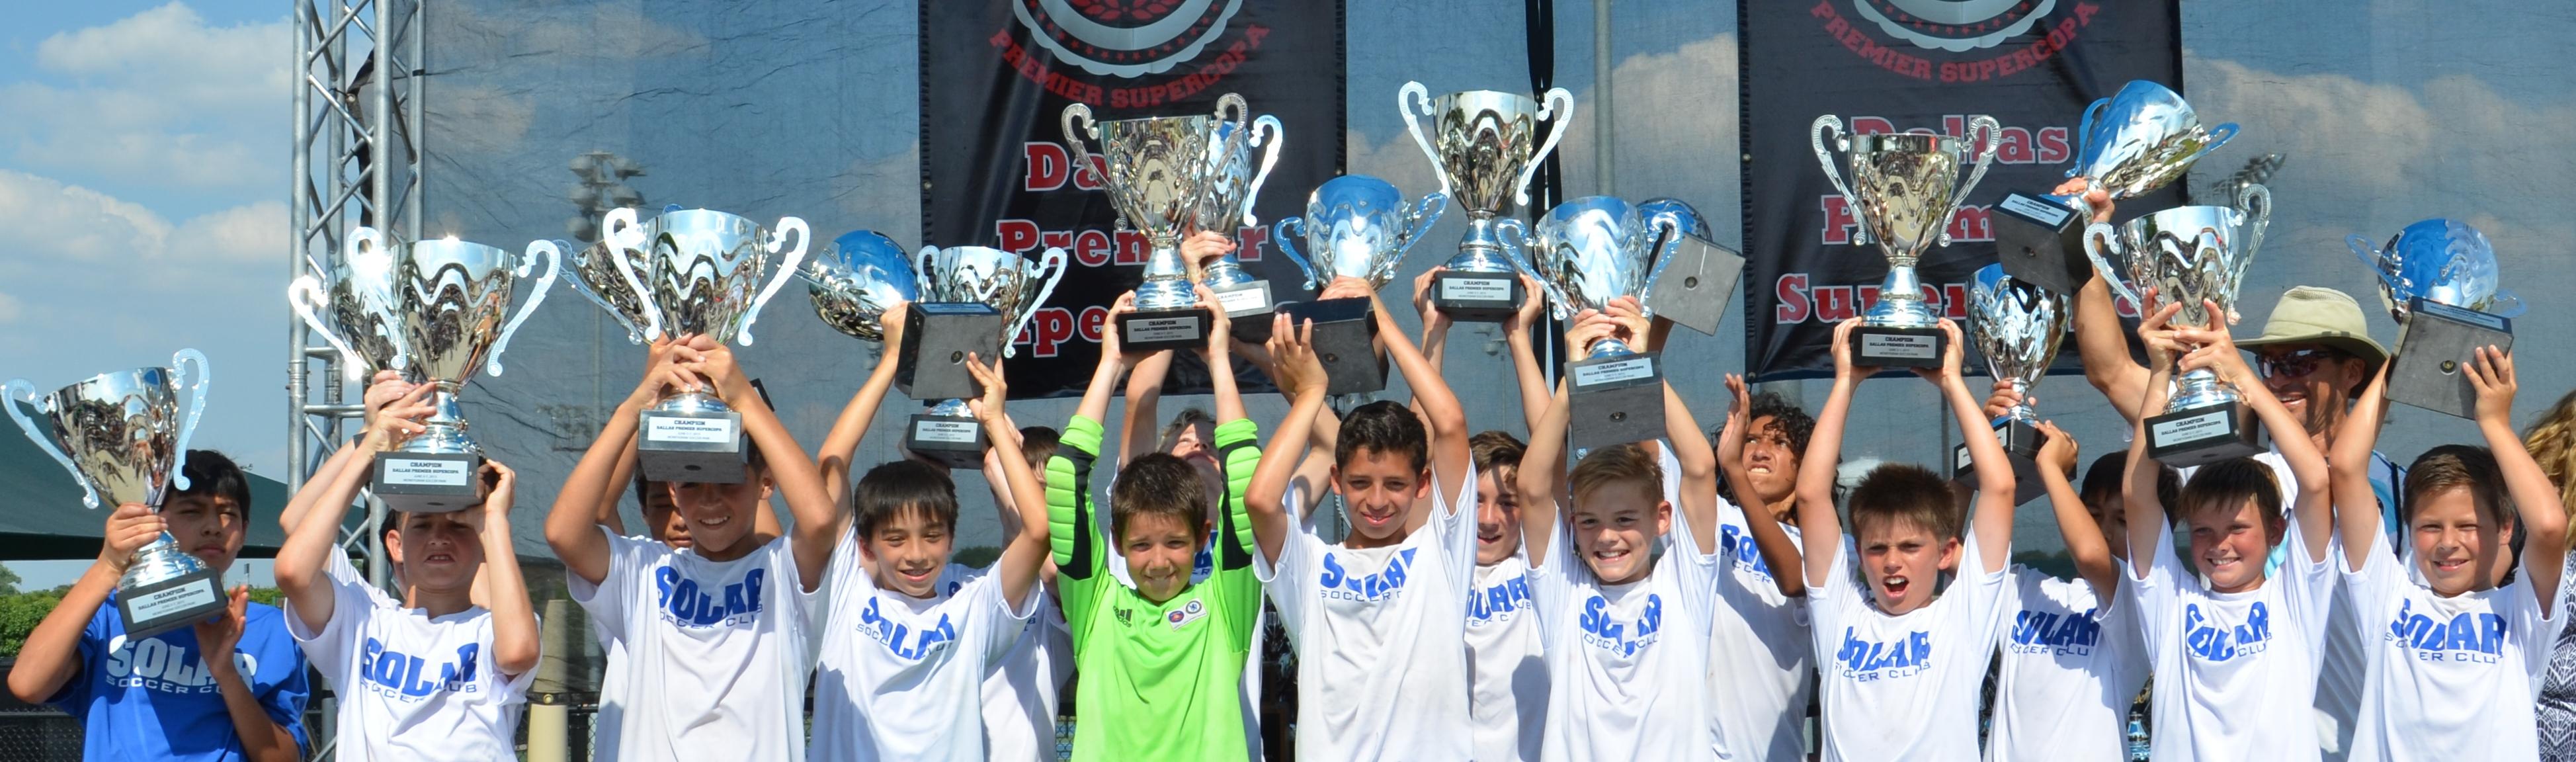 Solar Chelsea 03B Castro - U12 CHAMPIONS - website.jpg